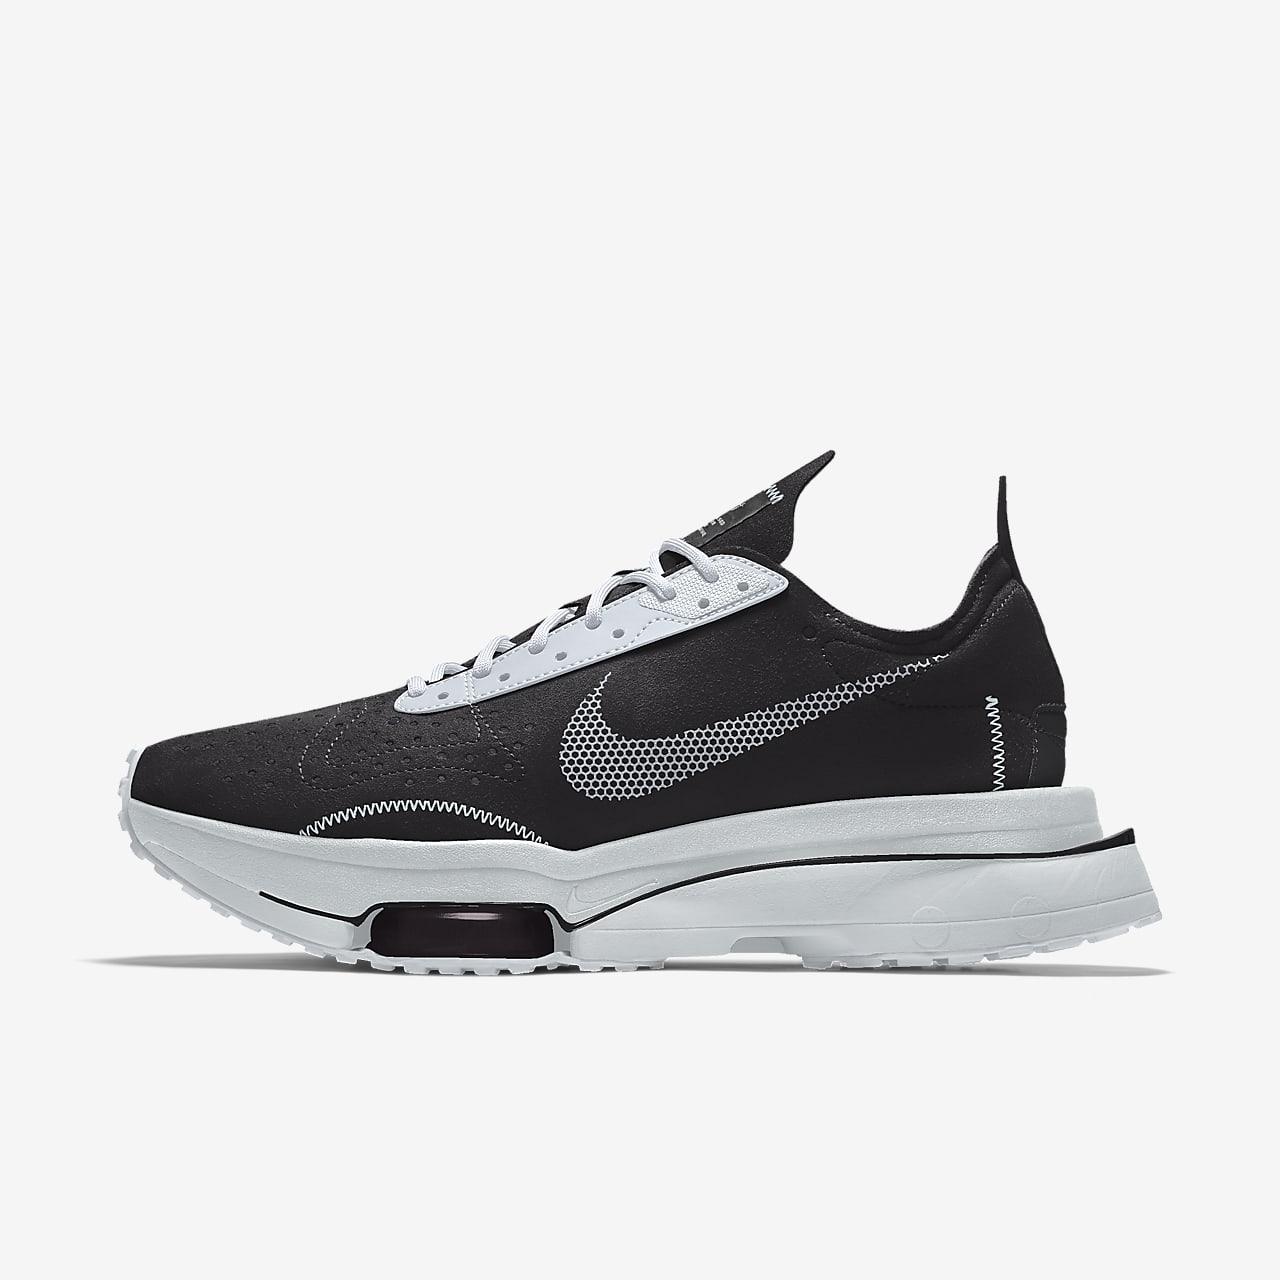 Nike Air Zoom-Type By You Custom Shoe